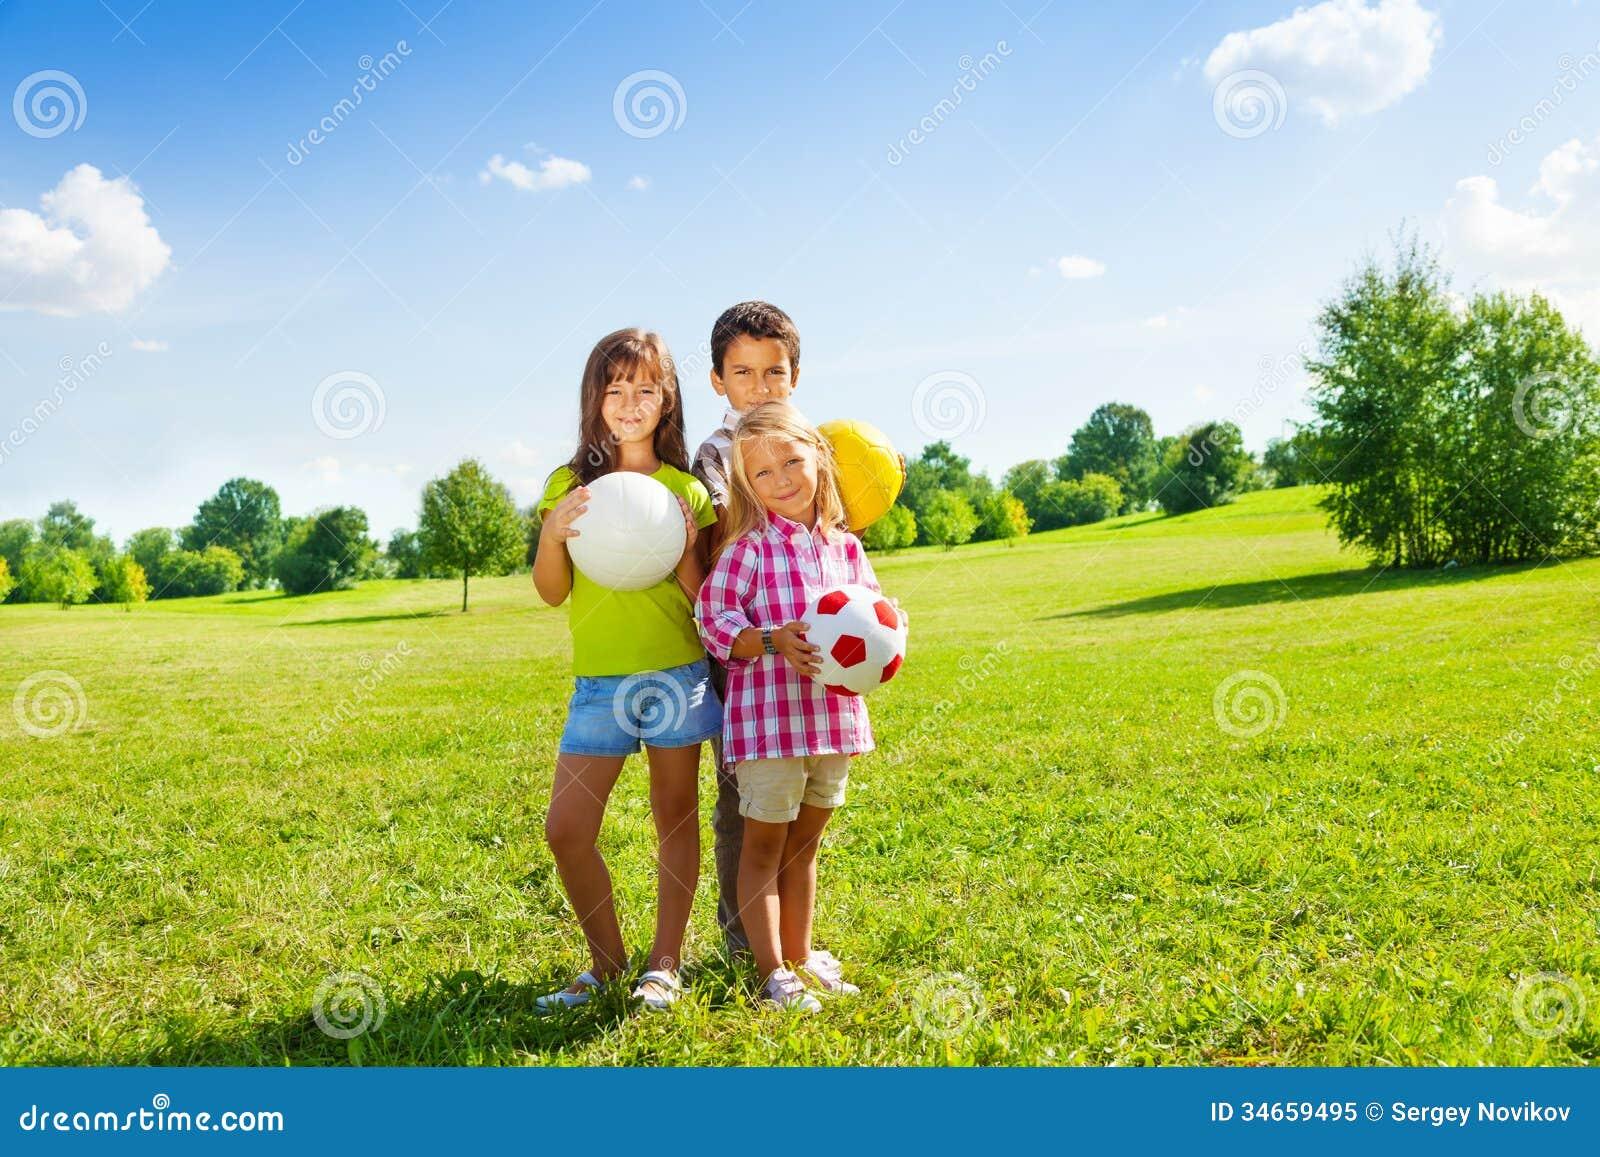 Three kids with sport balls